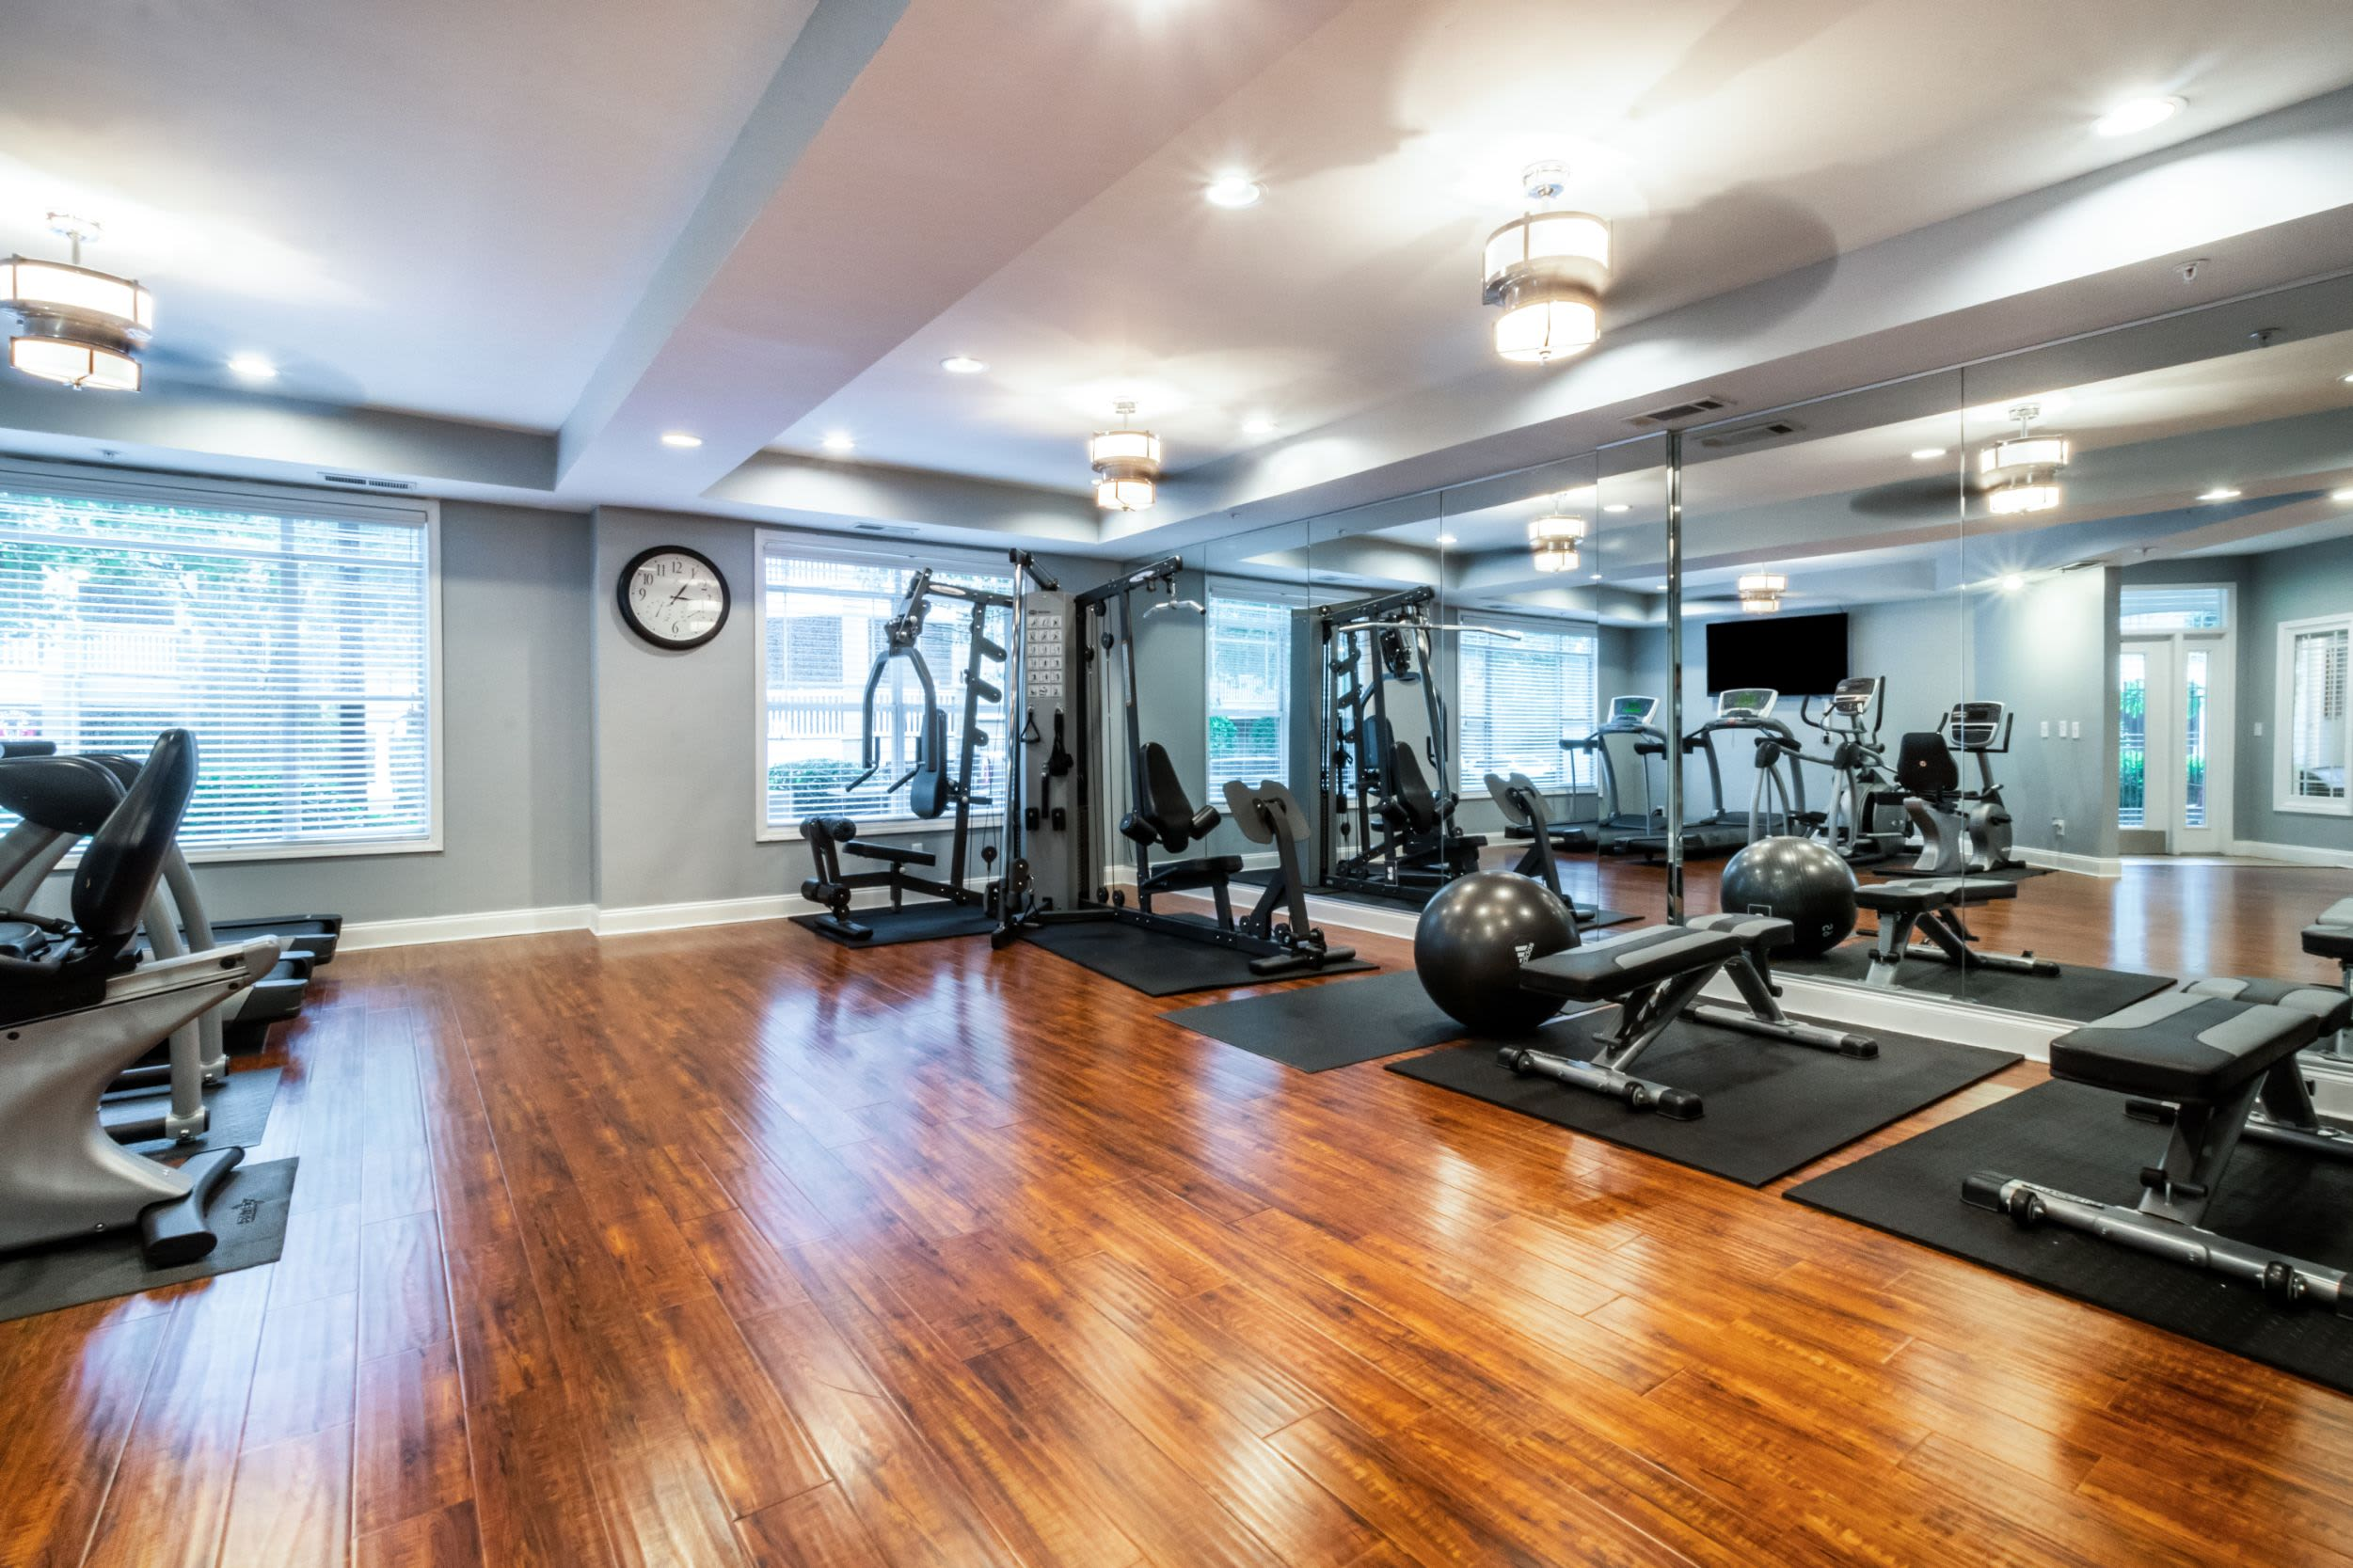 Fitness center at Marquis Midtown West in Atlanta, Georgia